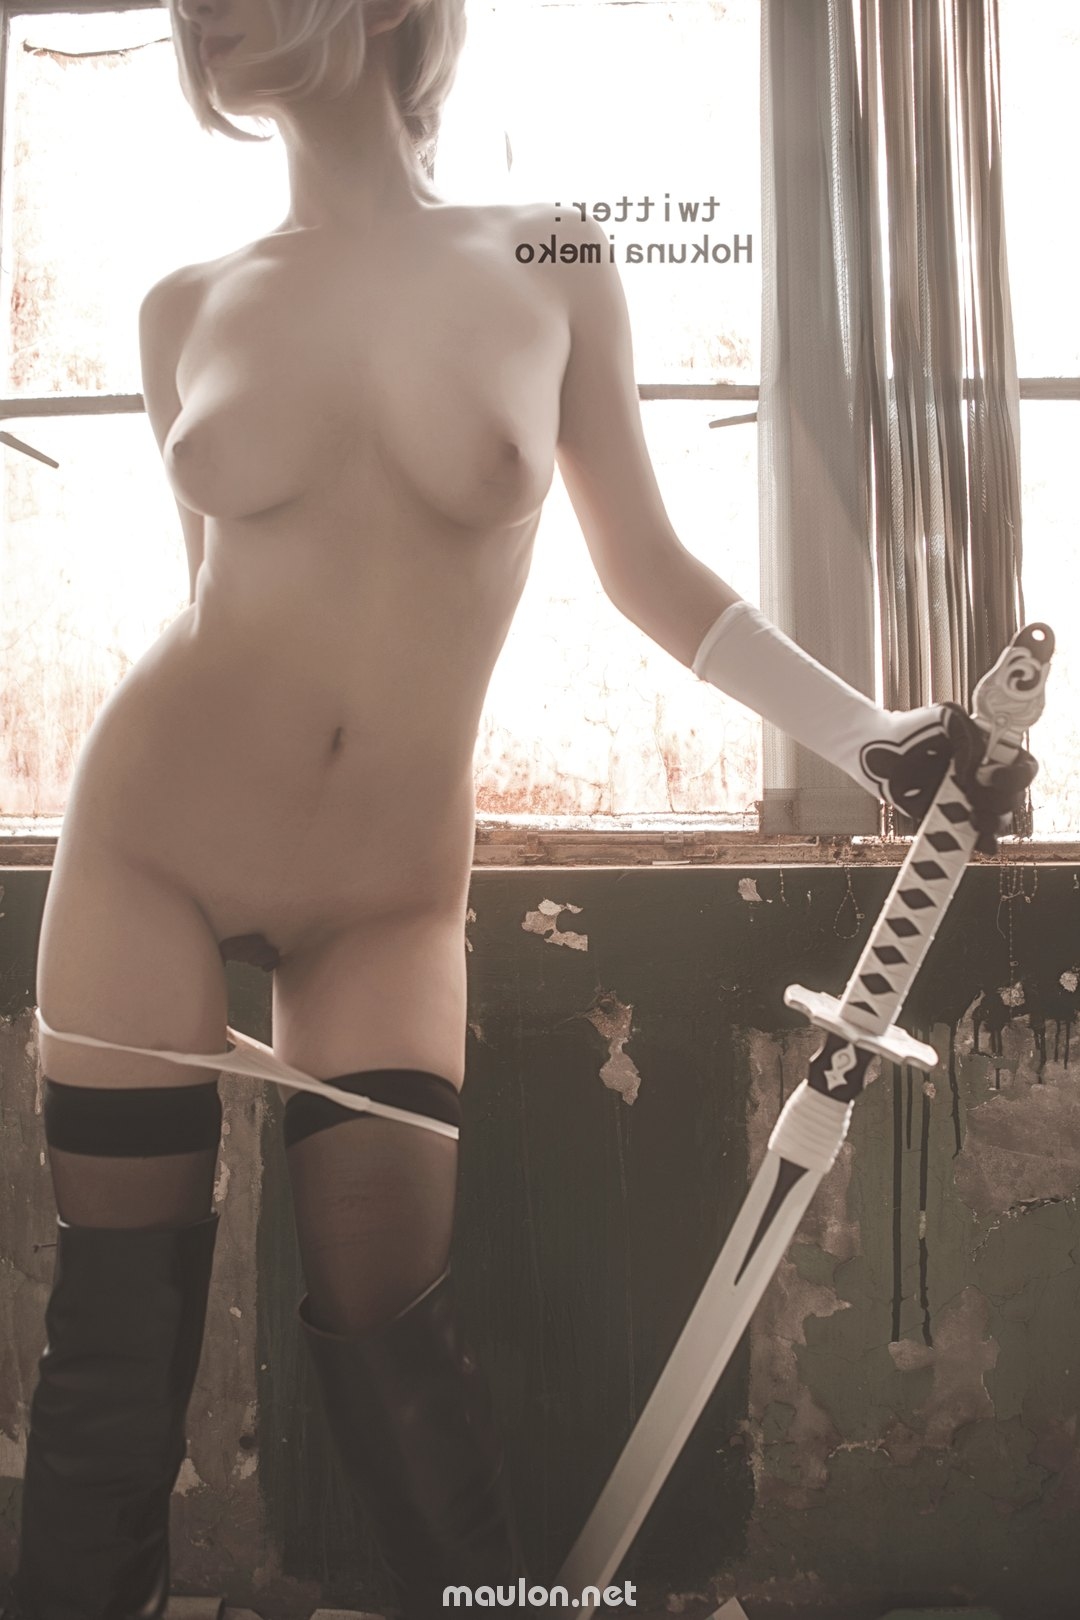 MauLon.Net - Ảnh sex Nữ samurai thèm trai